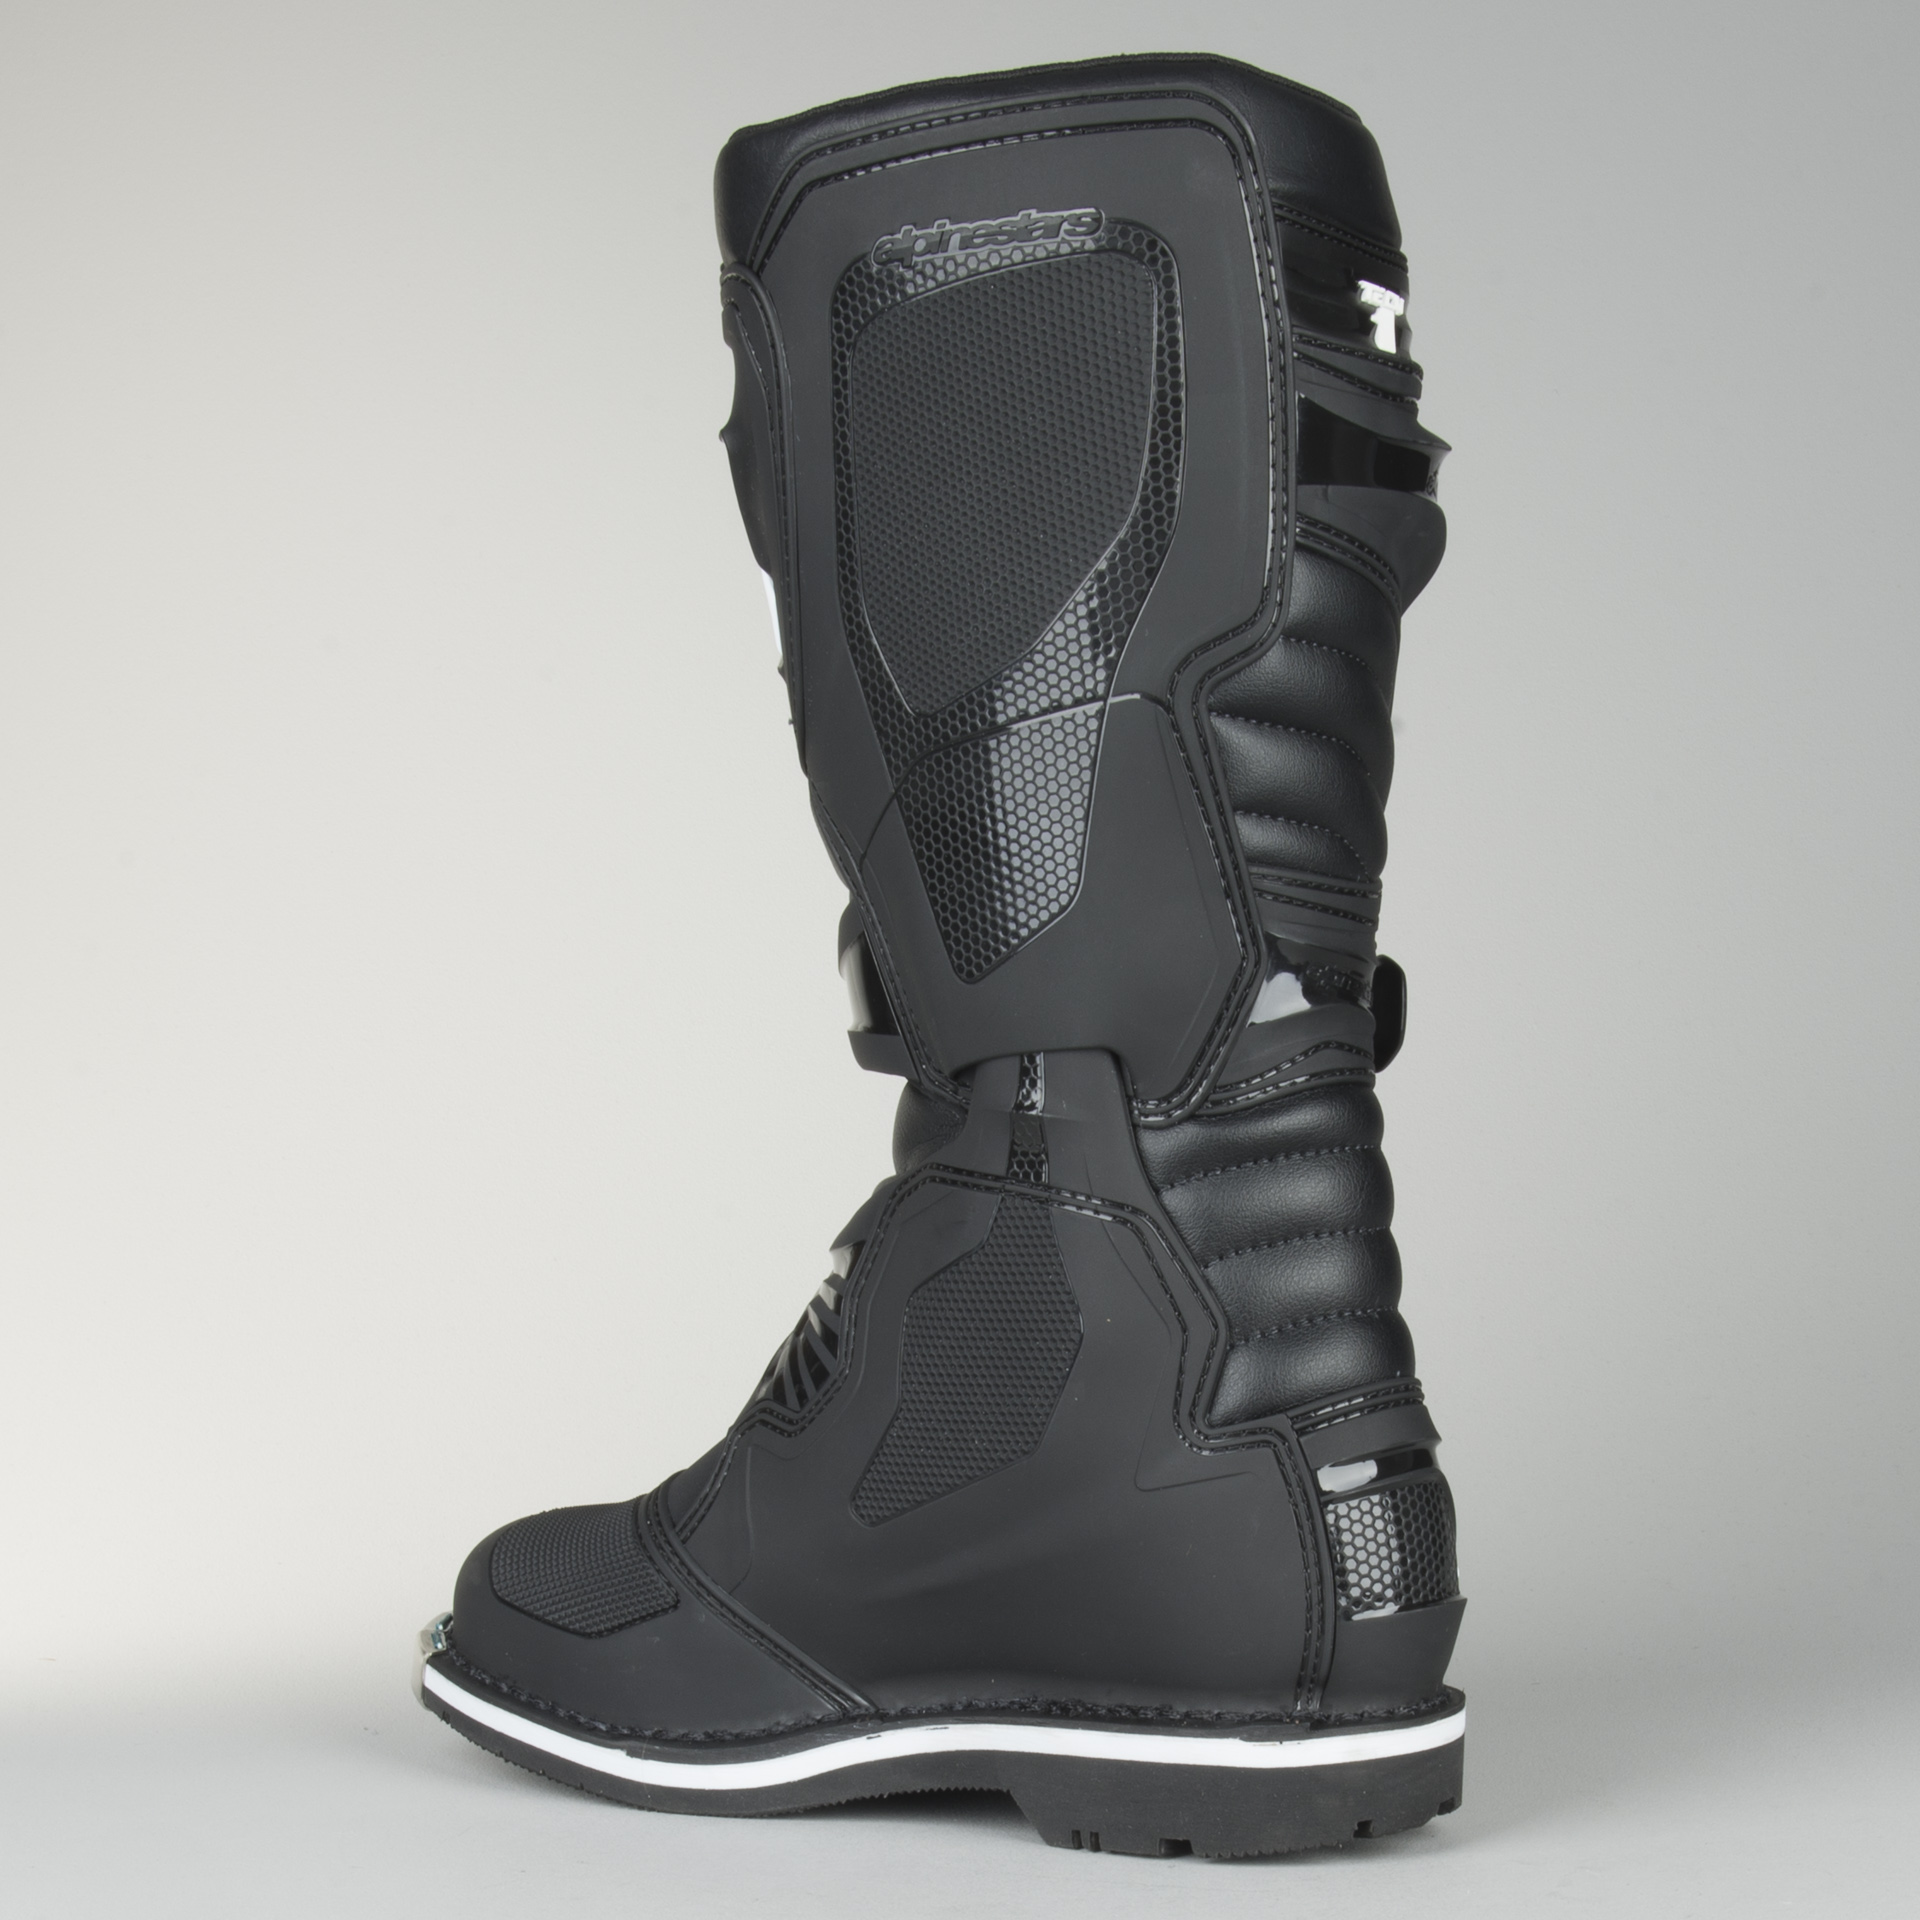 Alpinestars Tech 1 Boots-Black-16